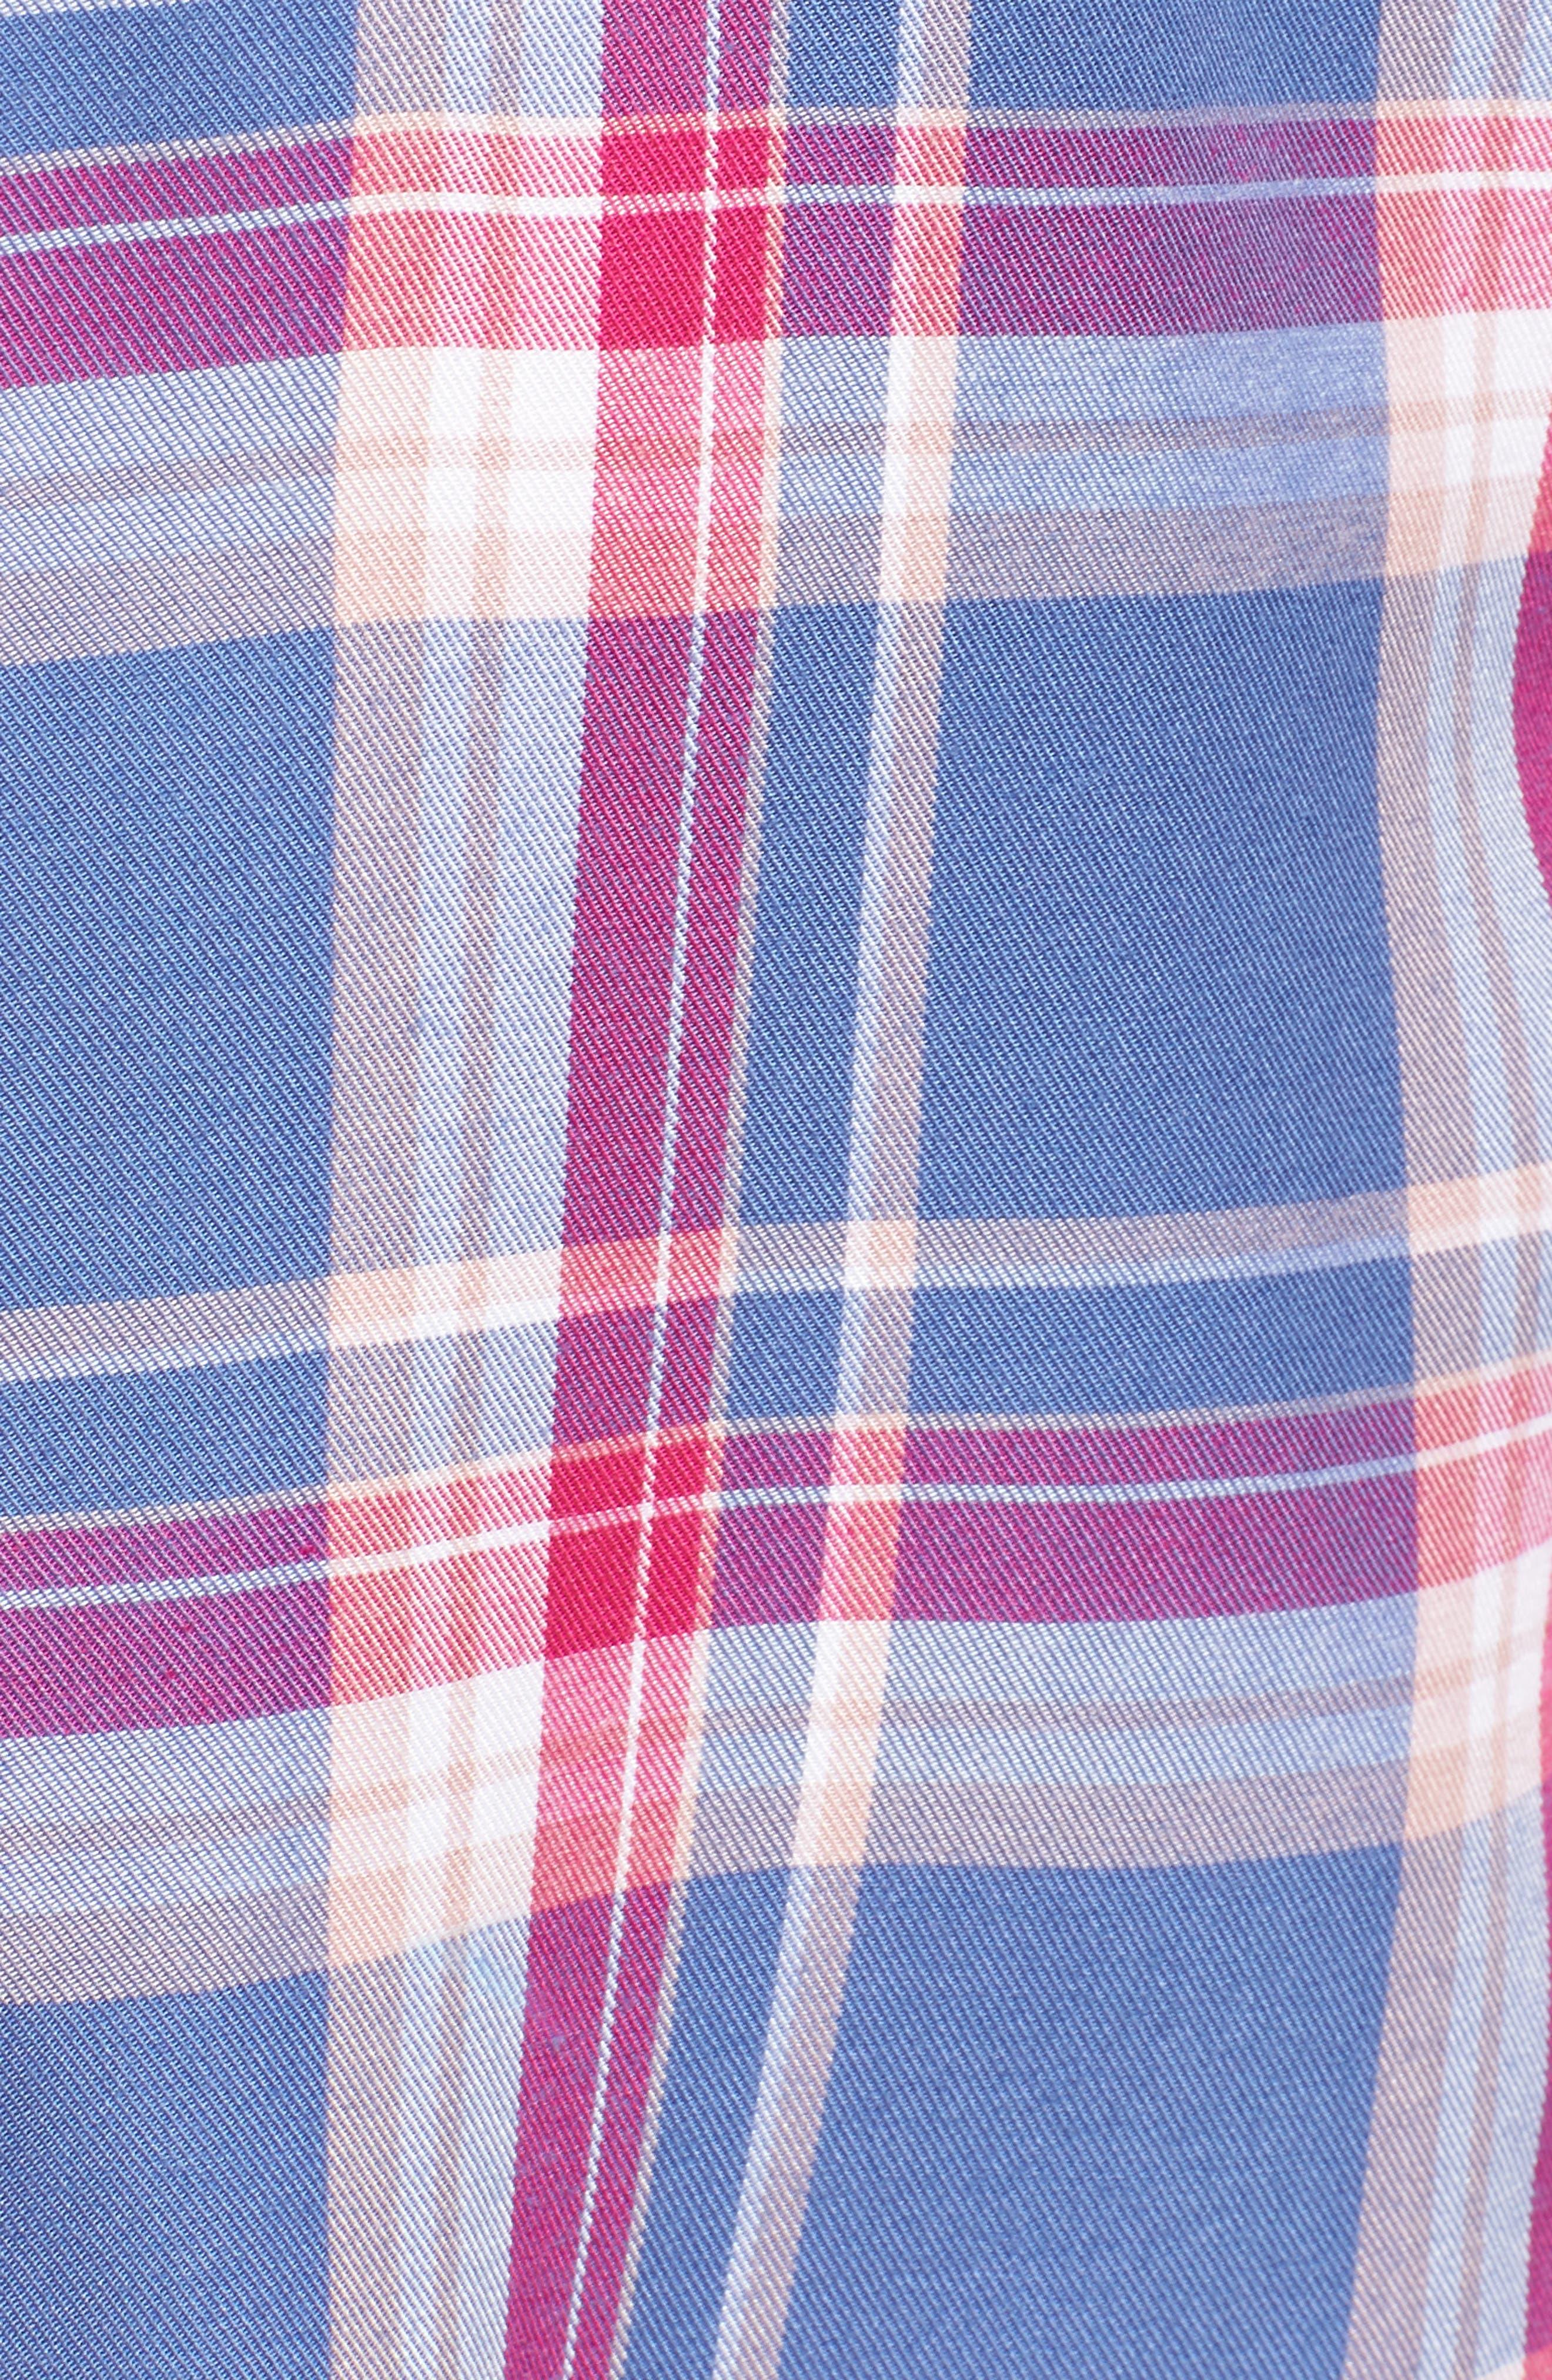 Plaid Boyfriend Shirt,                             Alternate thumbnail 6, color,                             Blue Denim Cube Plaid